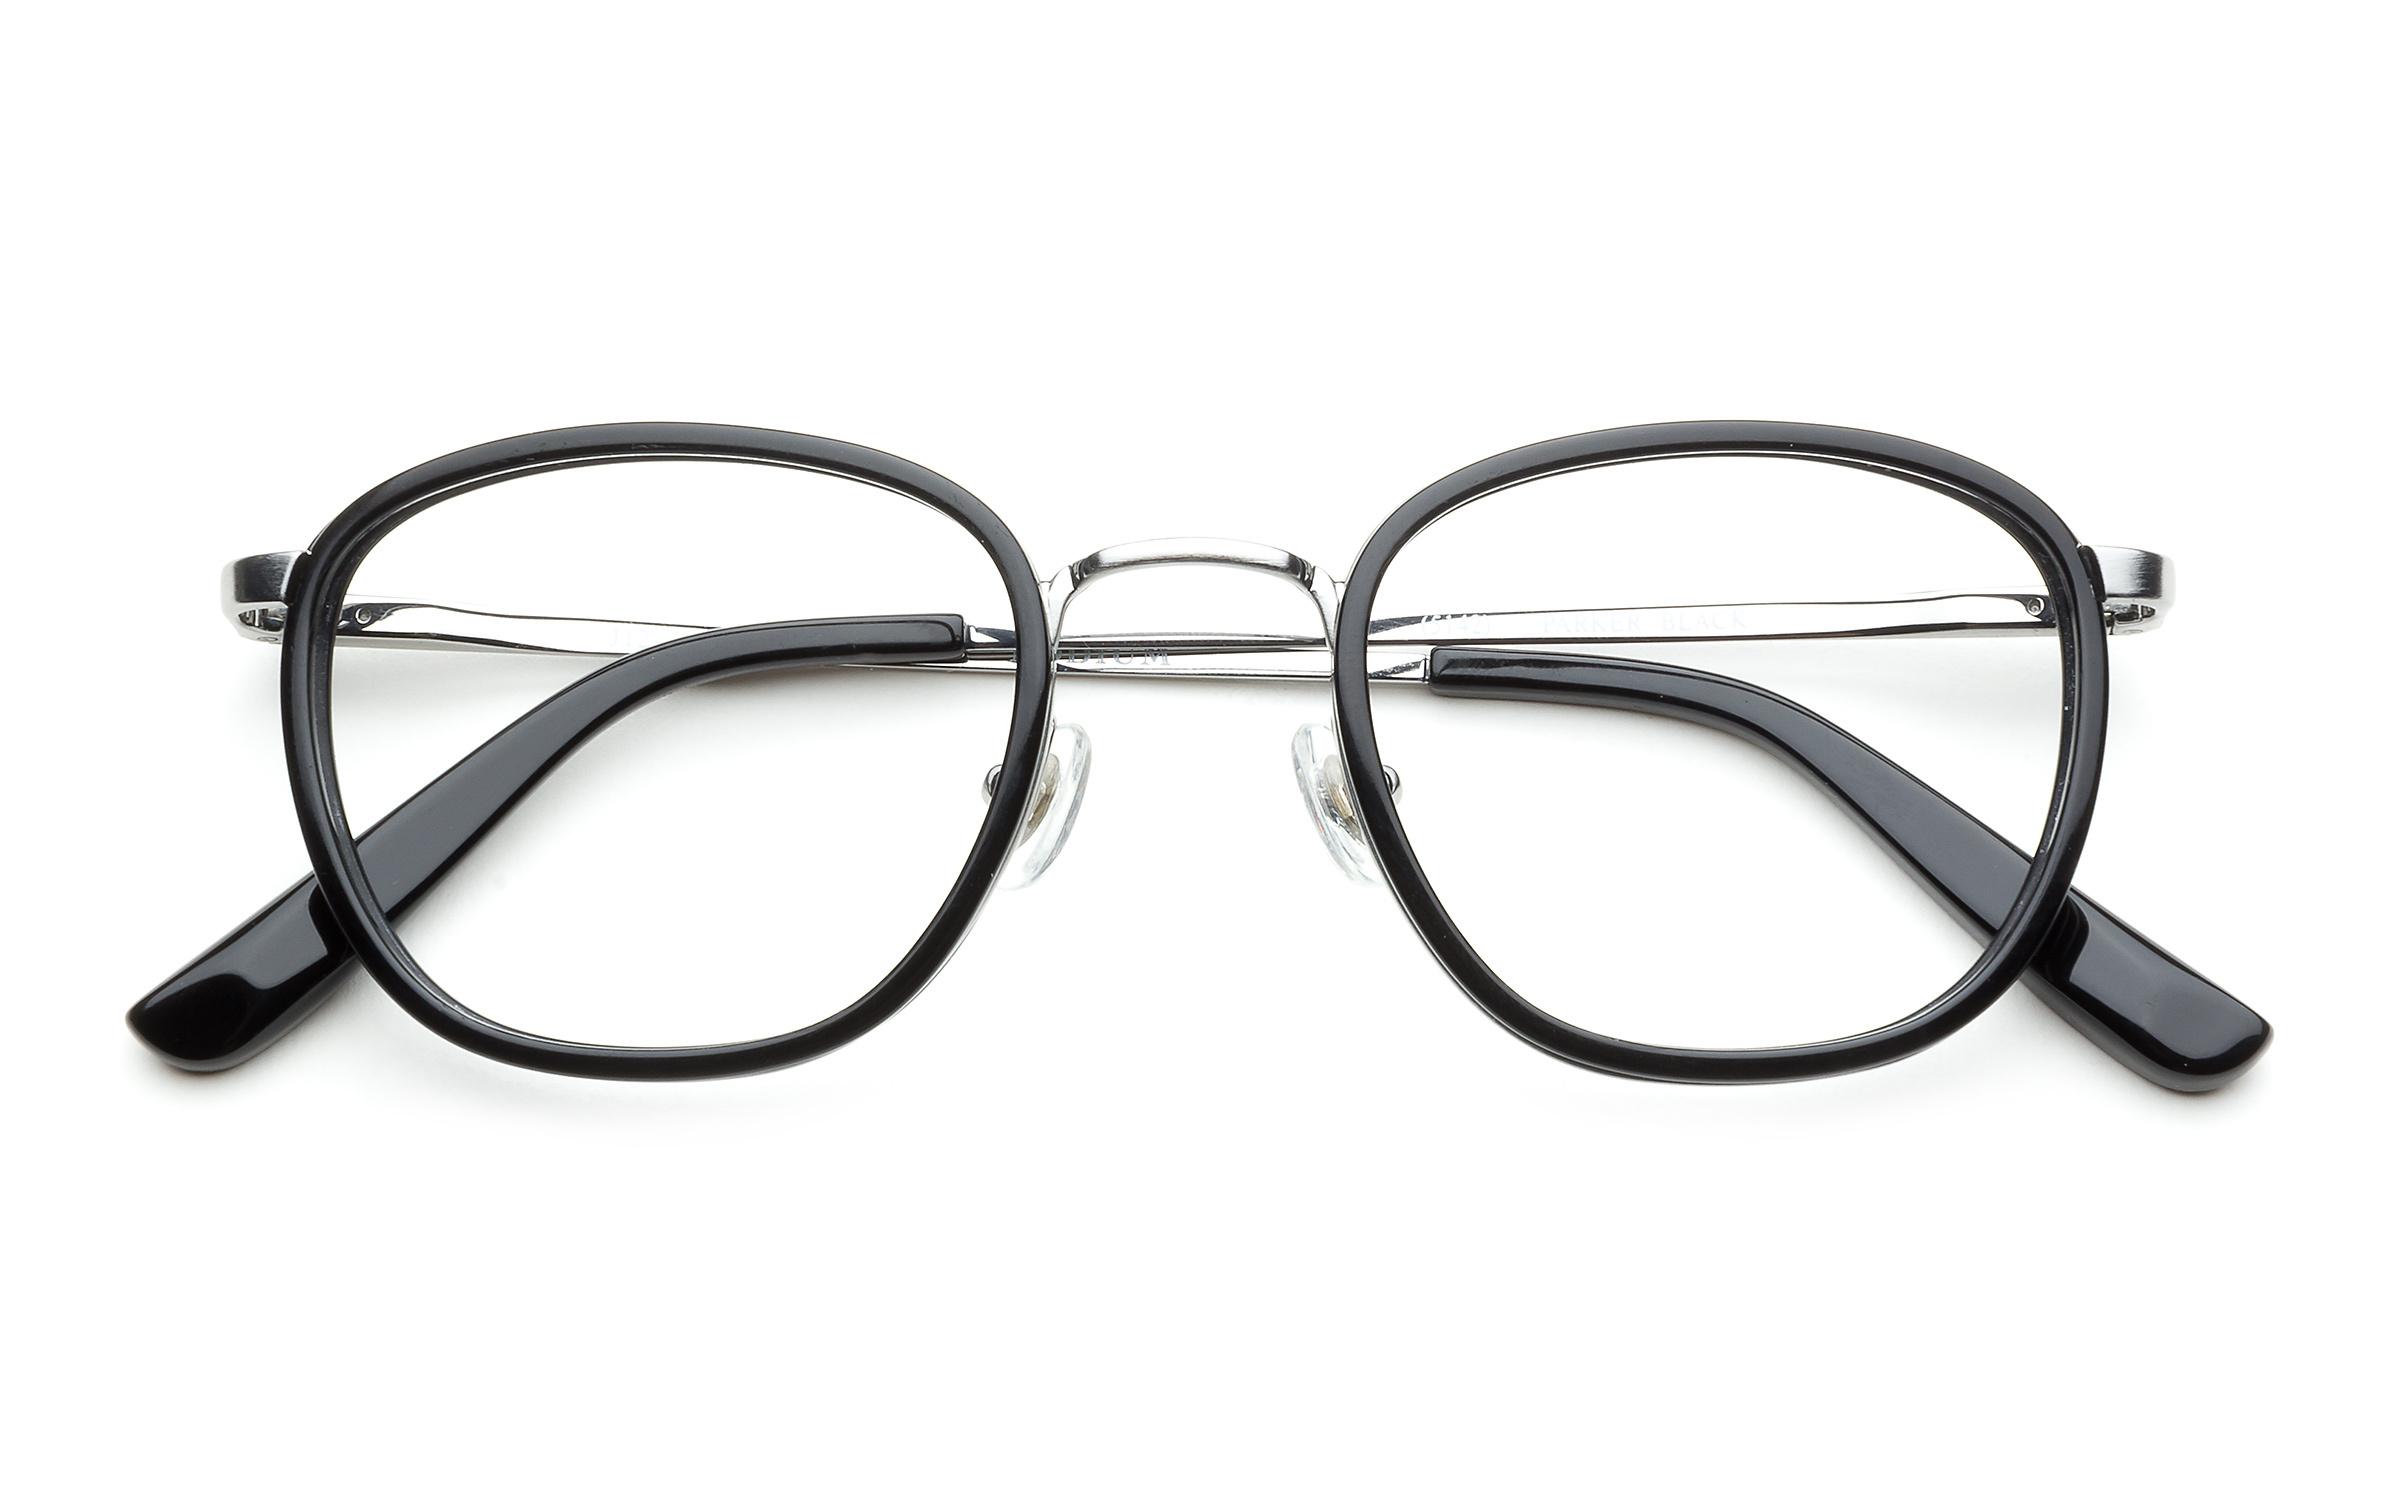 online lenses and frames  Prescription Glasses Online - Complete Eyeglasses from $35